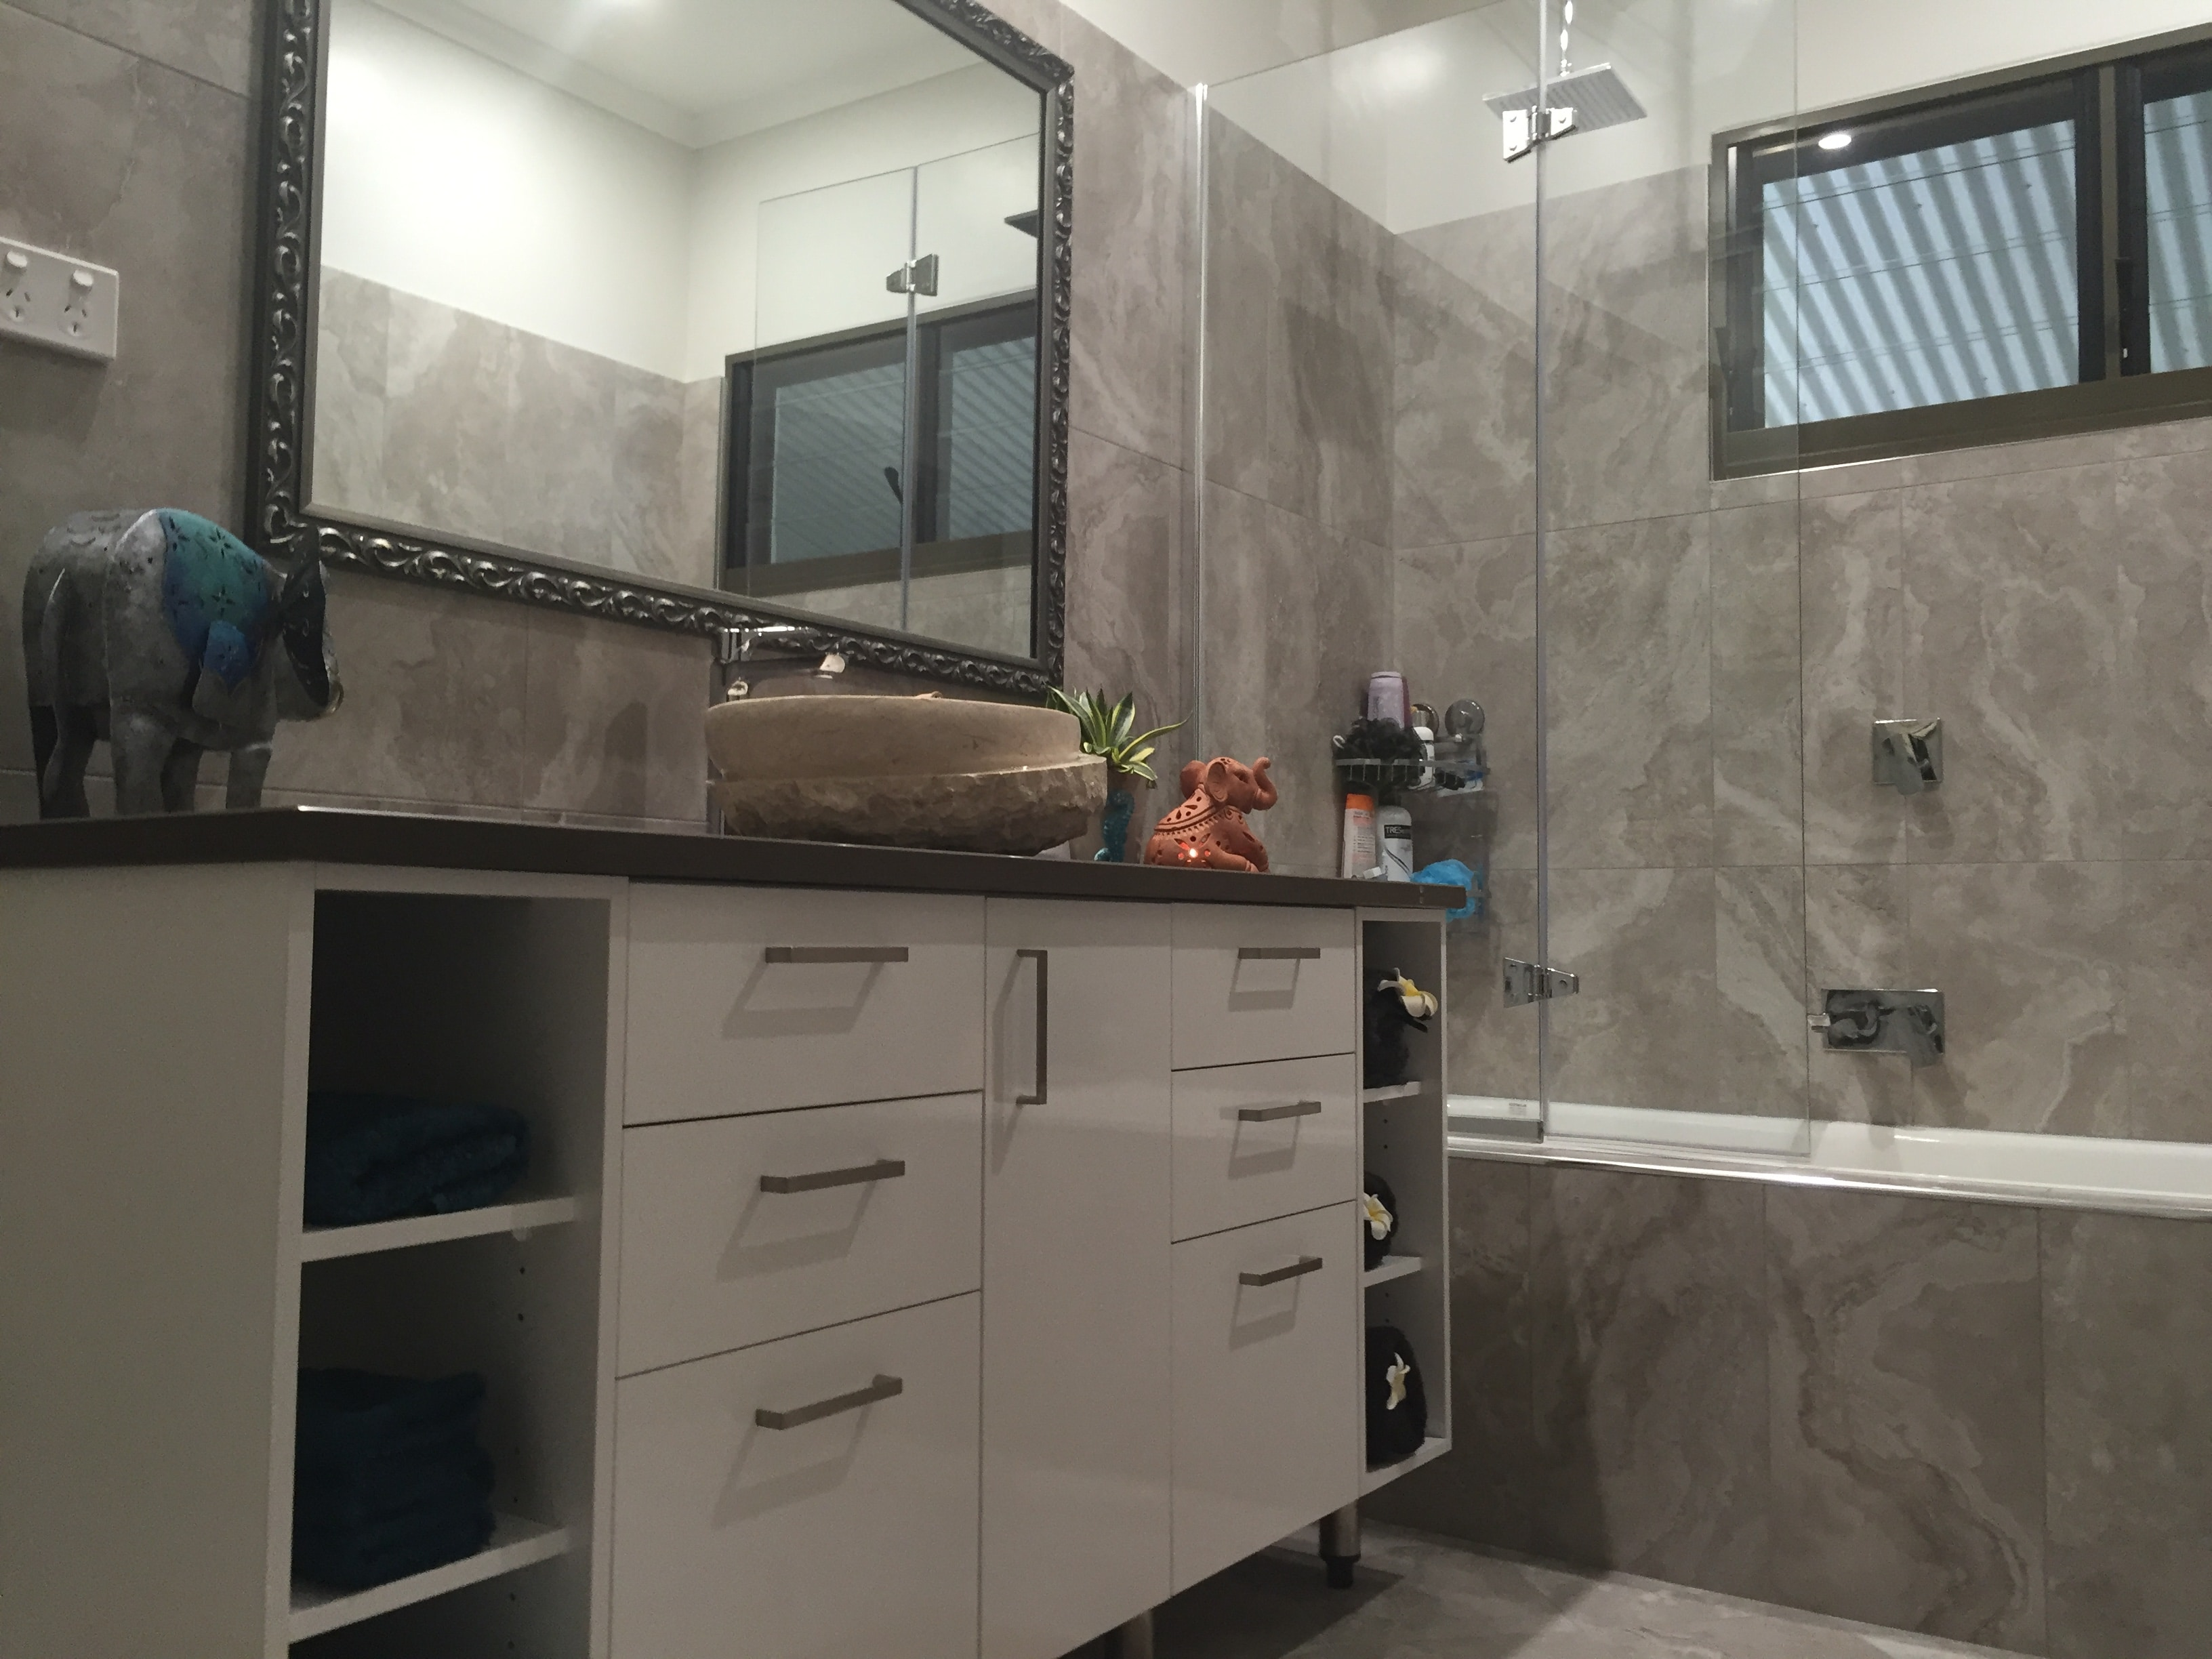 Bathroom Renovations Hawkesbury bathroom renovations darwin | szolfhok